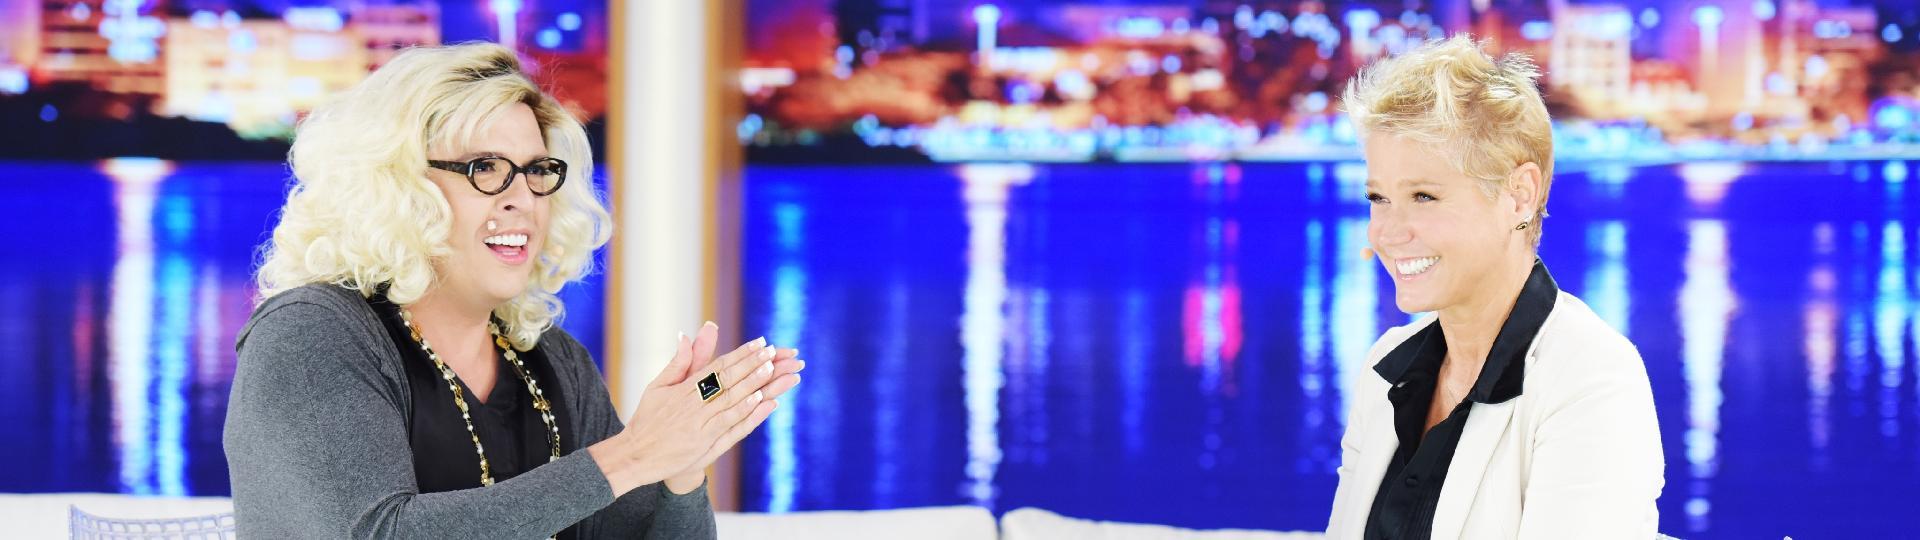 21.mar.2016 - Xuxa recebe o humorista Wellington Muniz, o Ceará, no palco de seu programa na Record. No encontro, a apresentadora é entrevistada por Gabi Herpes, personagem do humorista que satiriza a jornalista Marília Gabriela